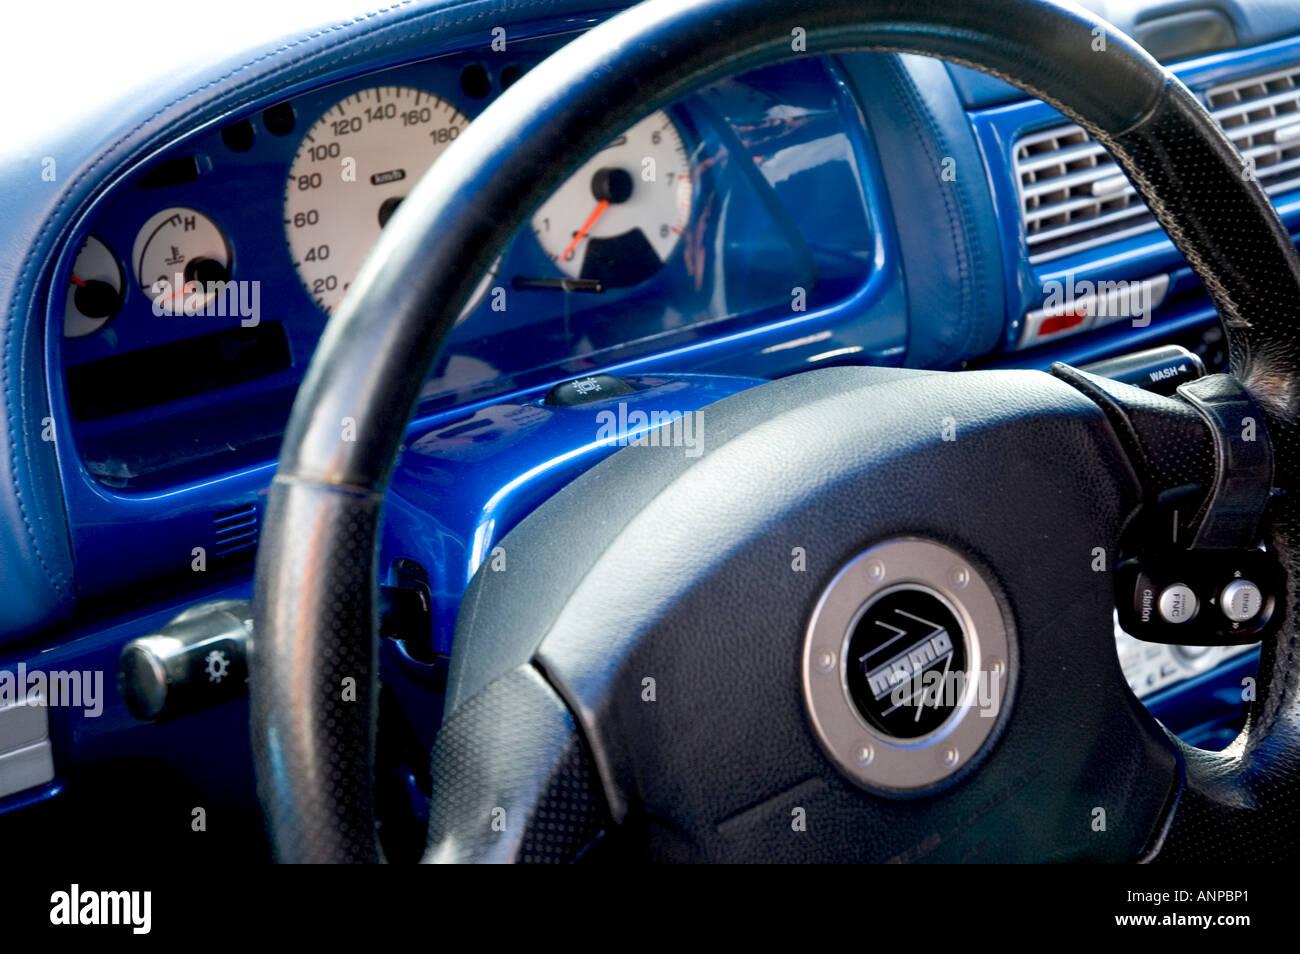 Carbureter Modification Speed Power Tuned Upgrade Europe